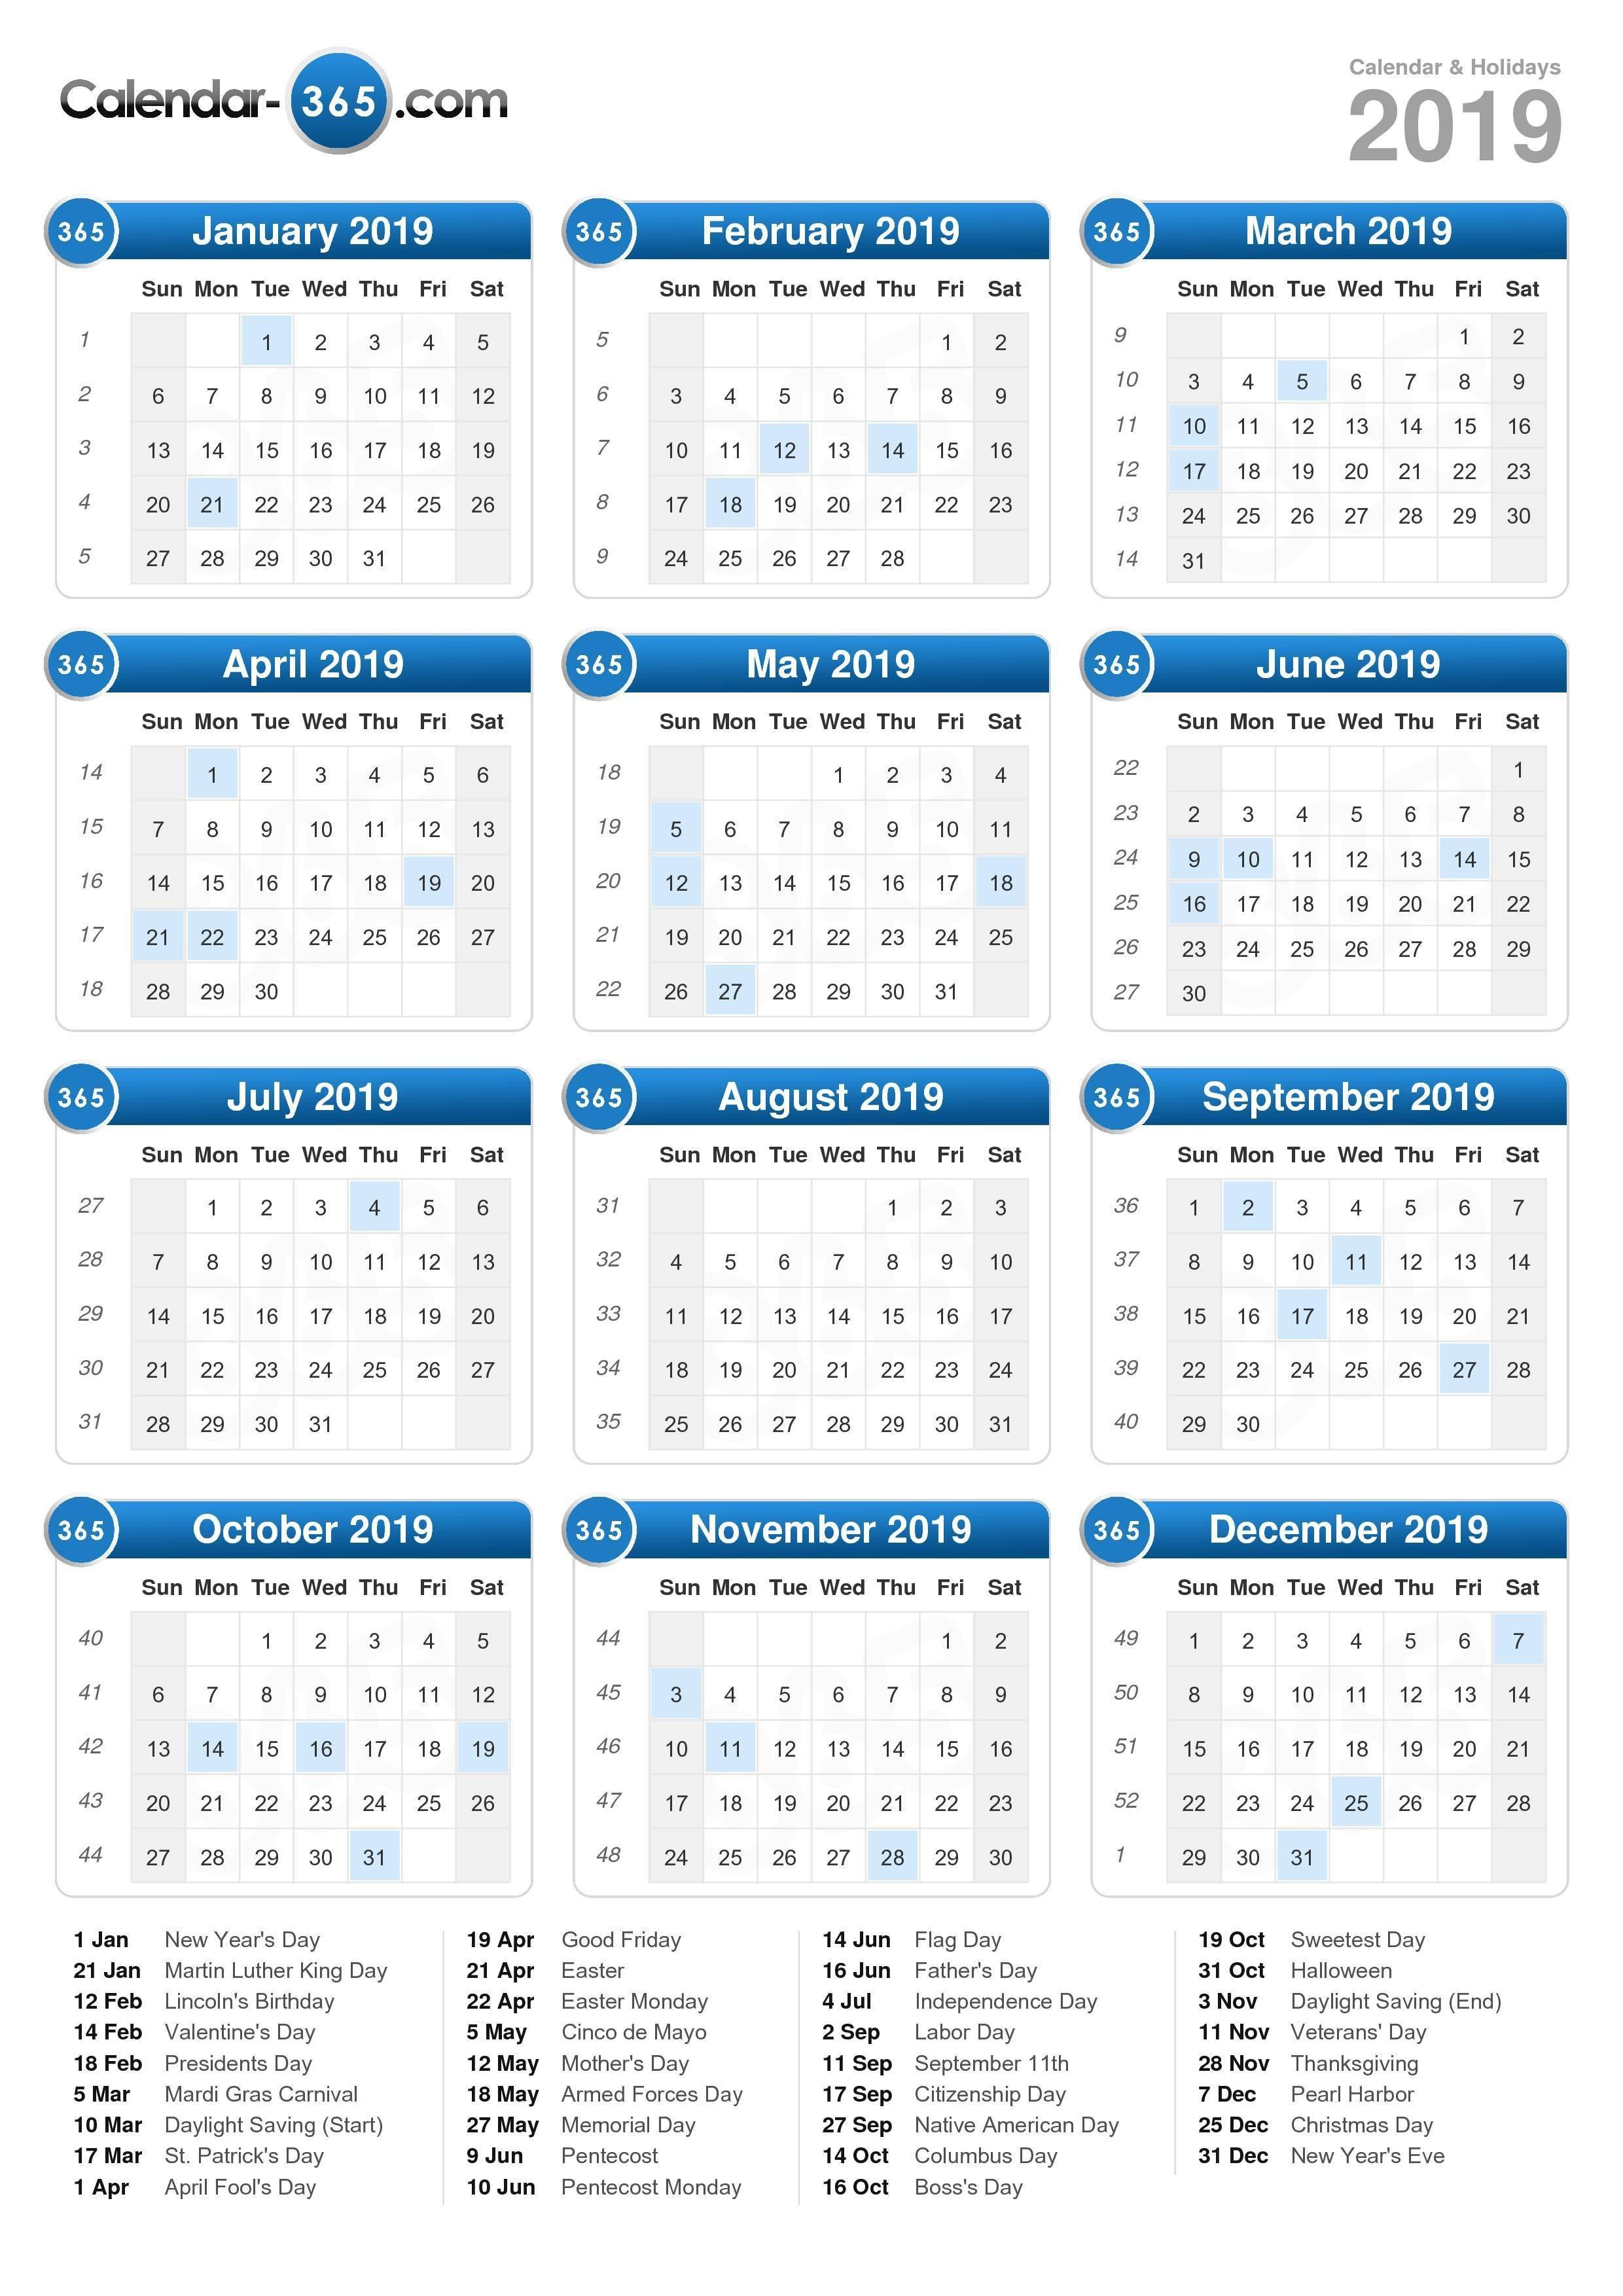 2019 Calendar Calendar Of 2019 With Holidays